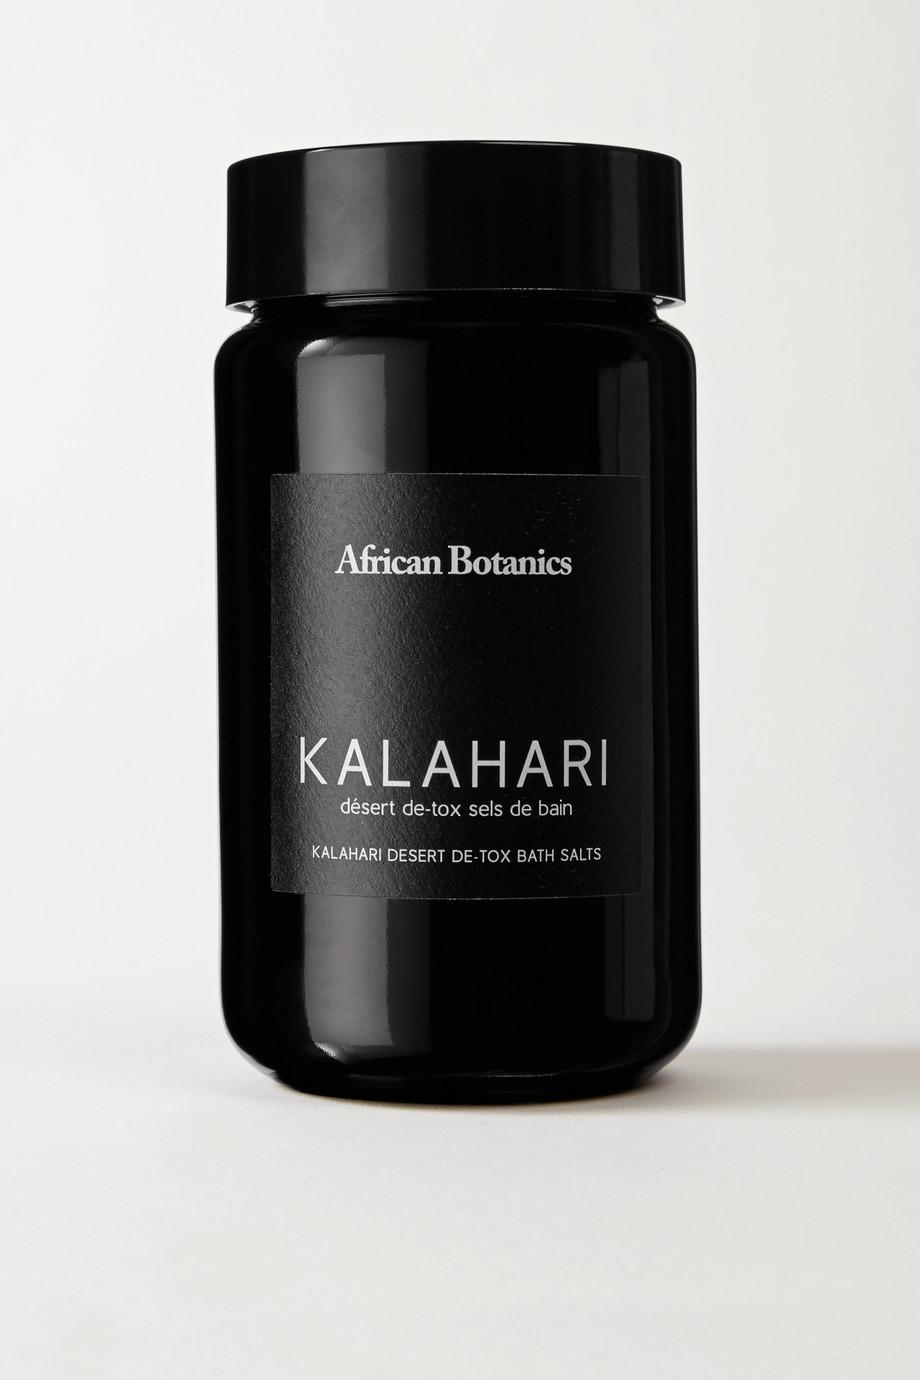 Kalahari Desert De-Tox Bath Salts, 500g